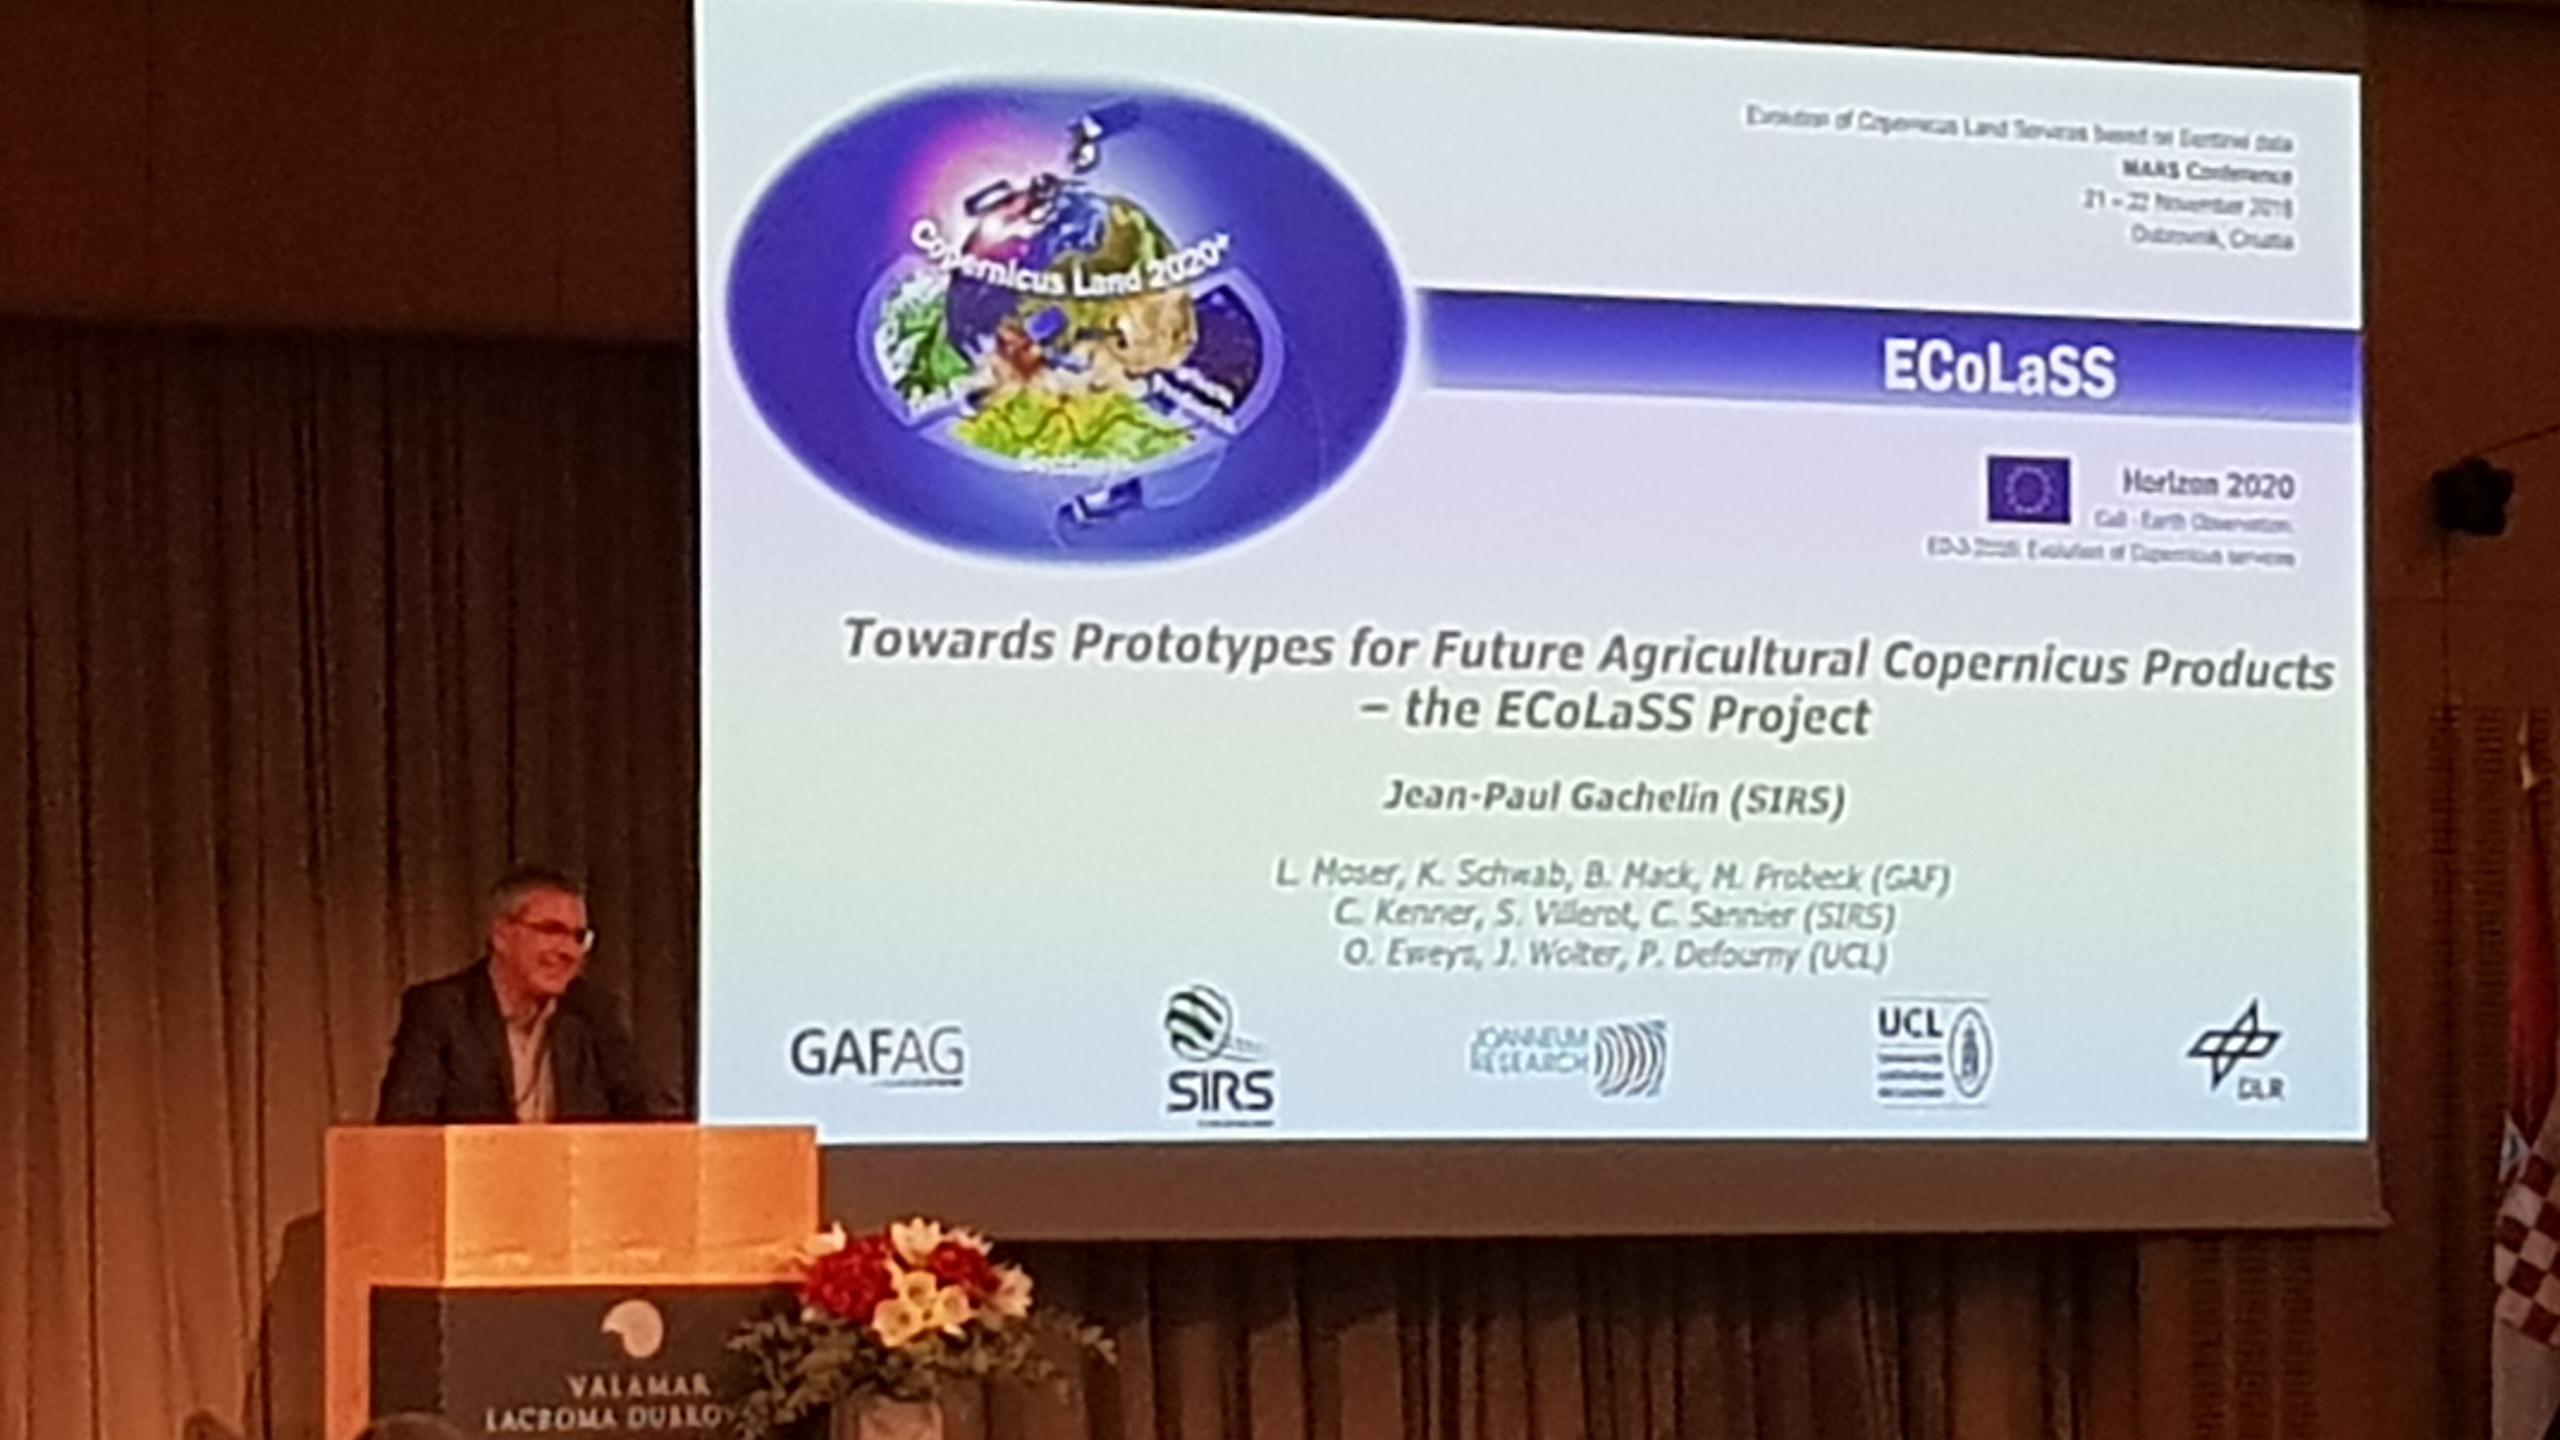 Jean-Paul Gachelin from SIRS presenting ECoLaSS (© GAF AG)